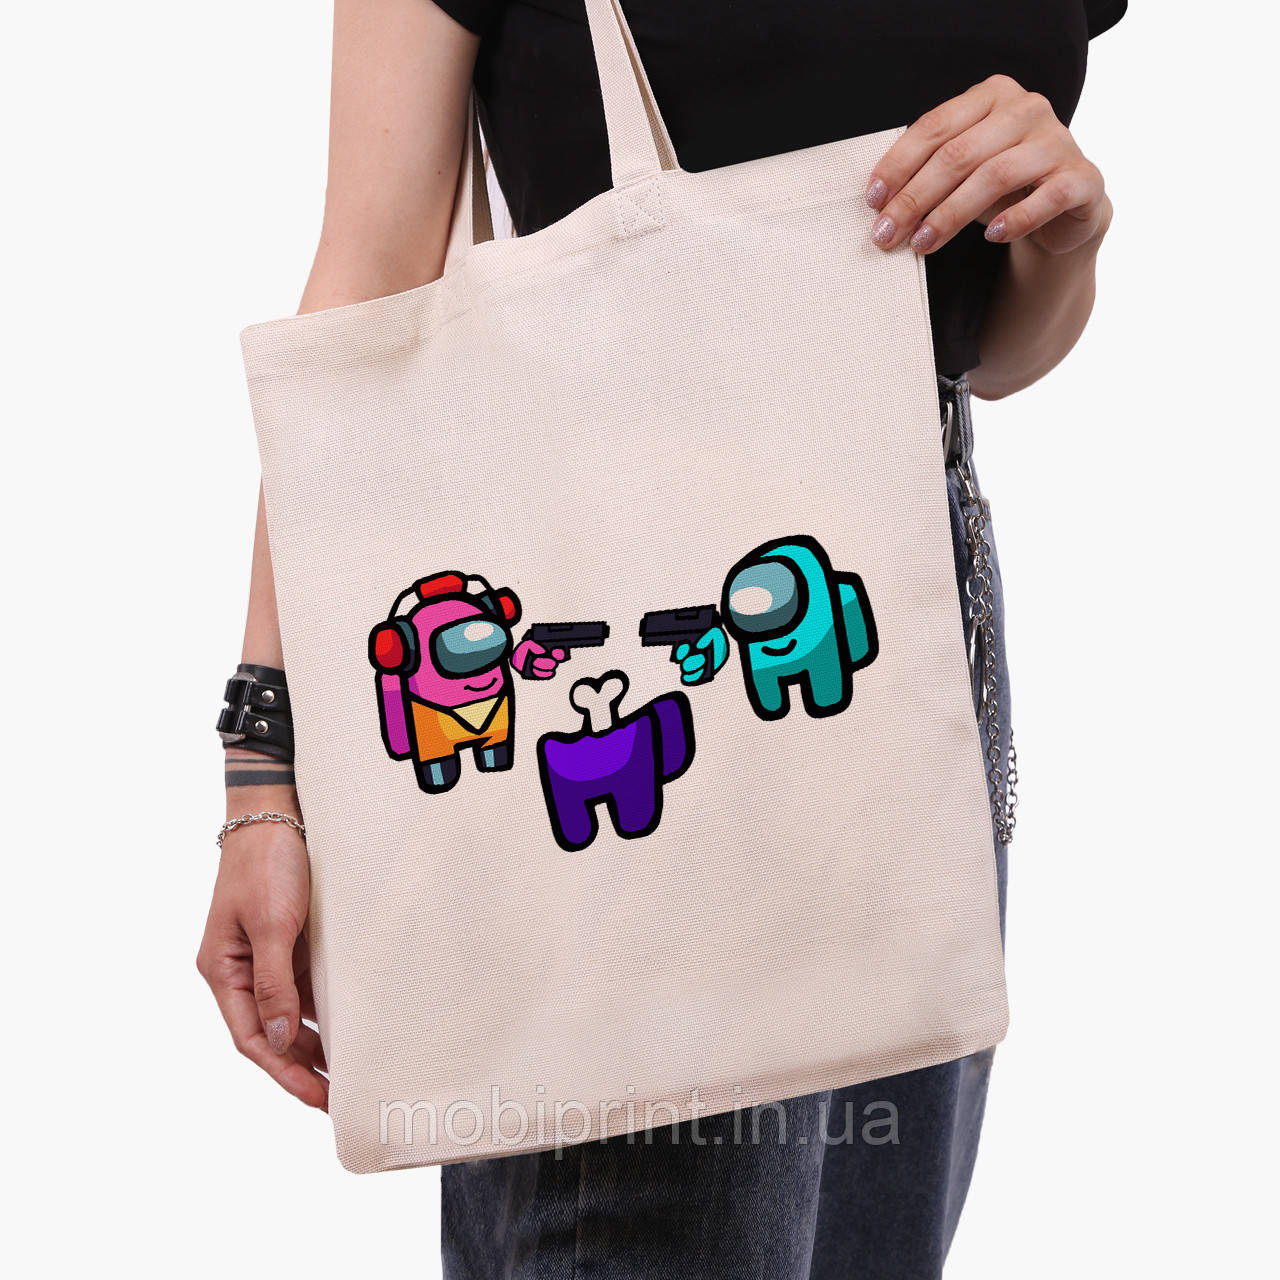 Эко сумка шоппер Амонг Ас (Among Us) (9227-2598)  41*35 см